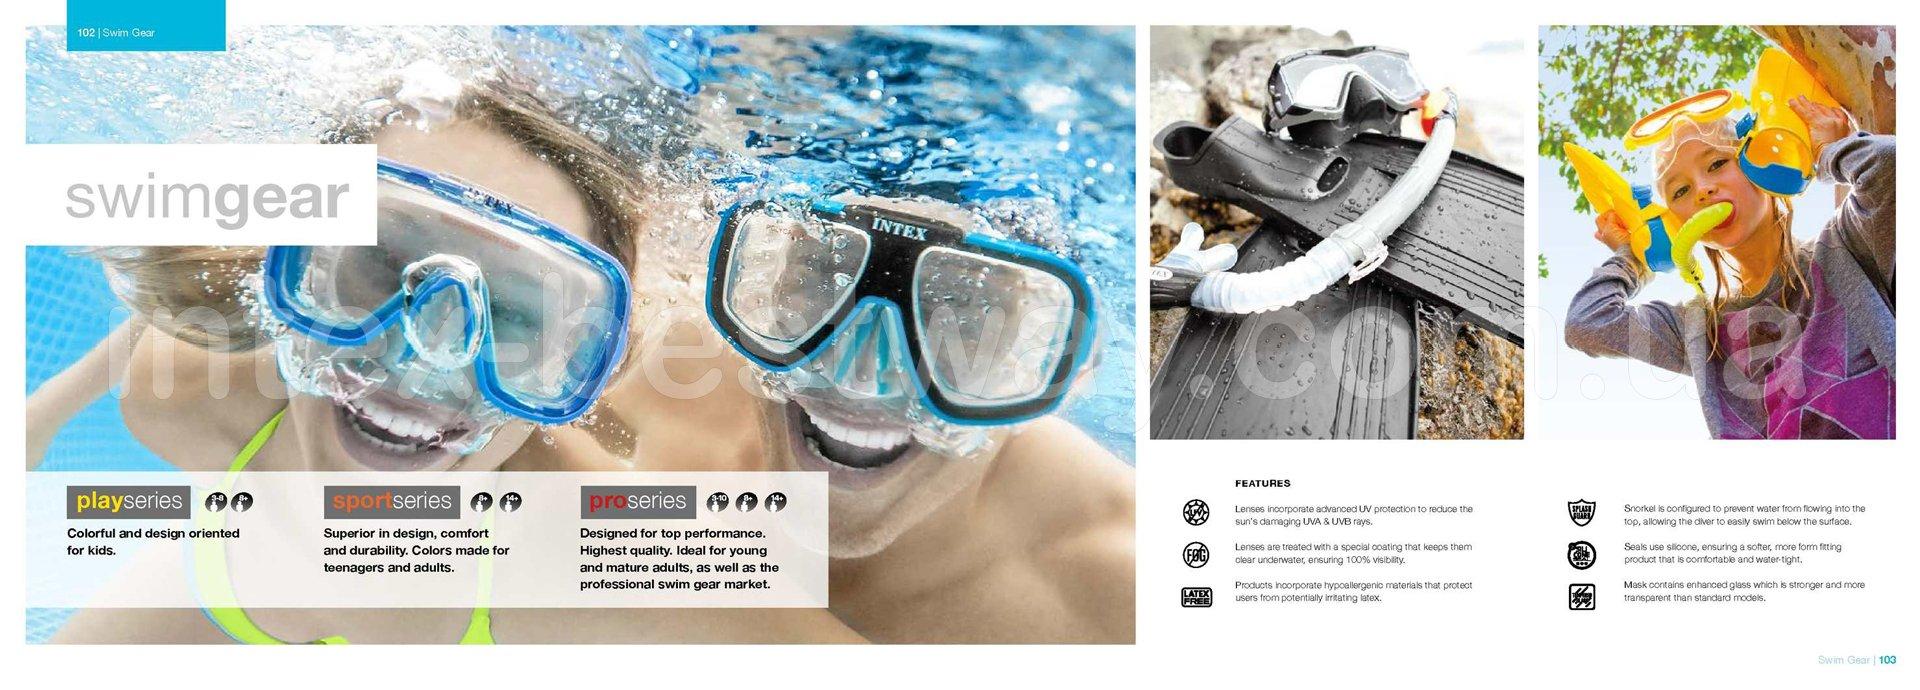 Маски для плавания Intex, Набор для плавания Intex, Трубка для плавания Intex, Очки для плавания Intex